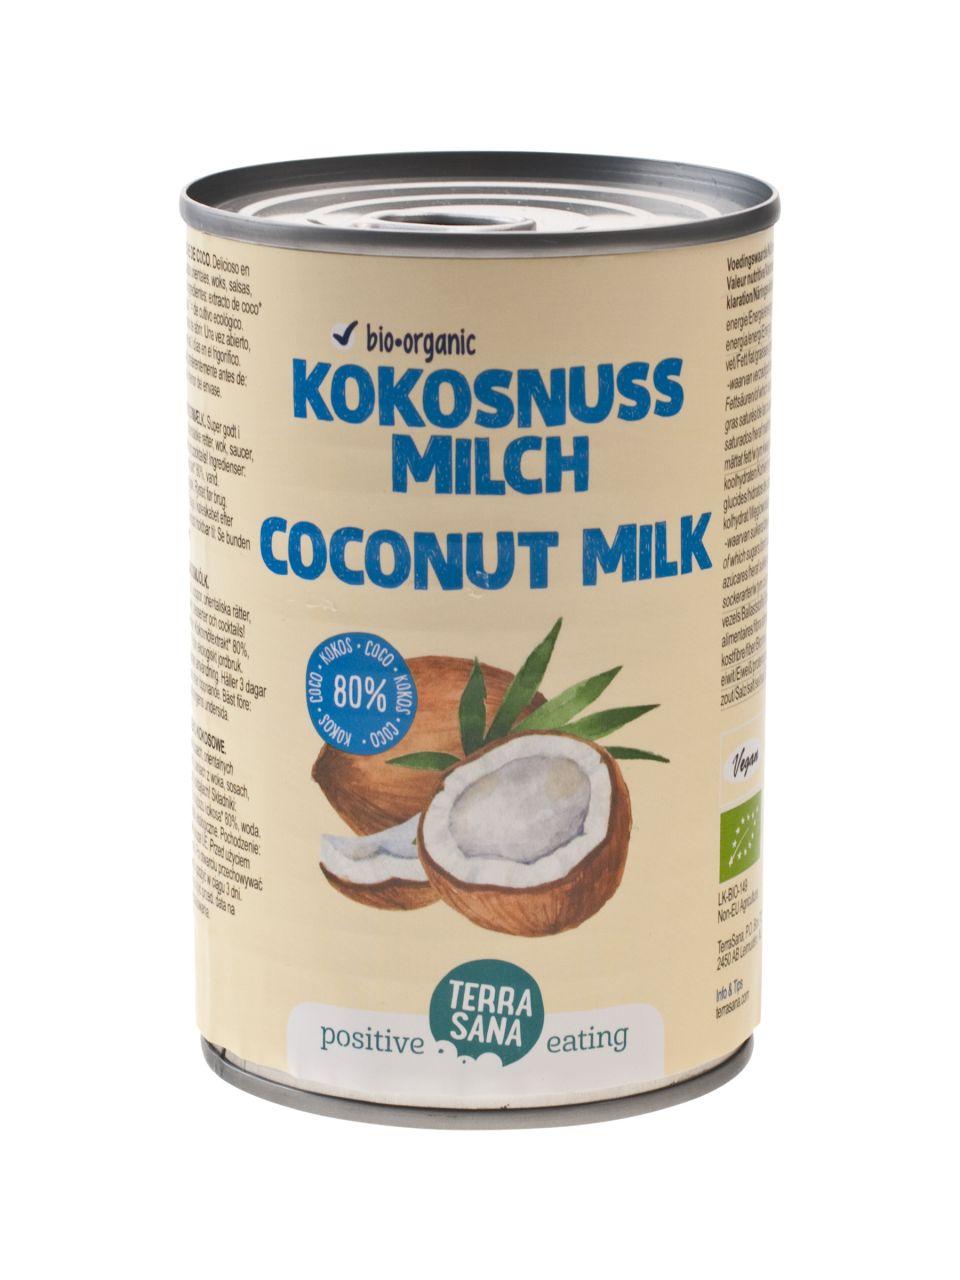 Kokosmilch (22% Fett - 80% Kokos - Guargomfrei)